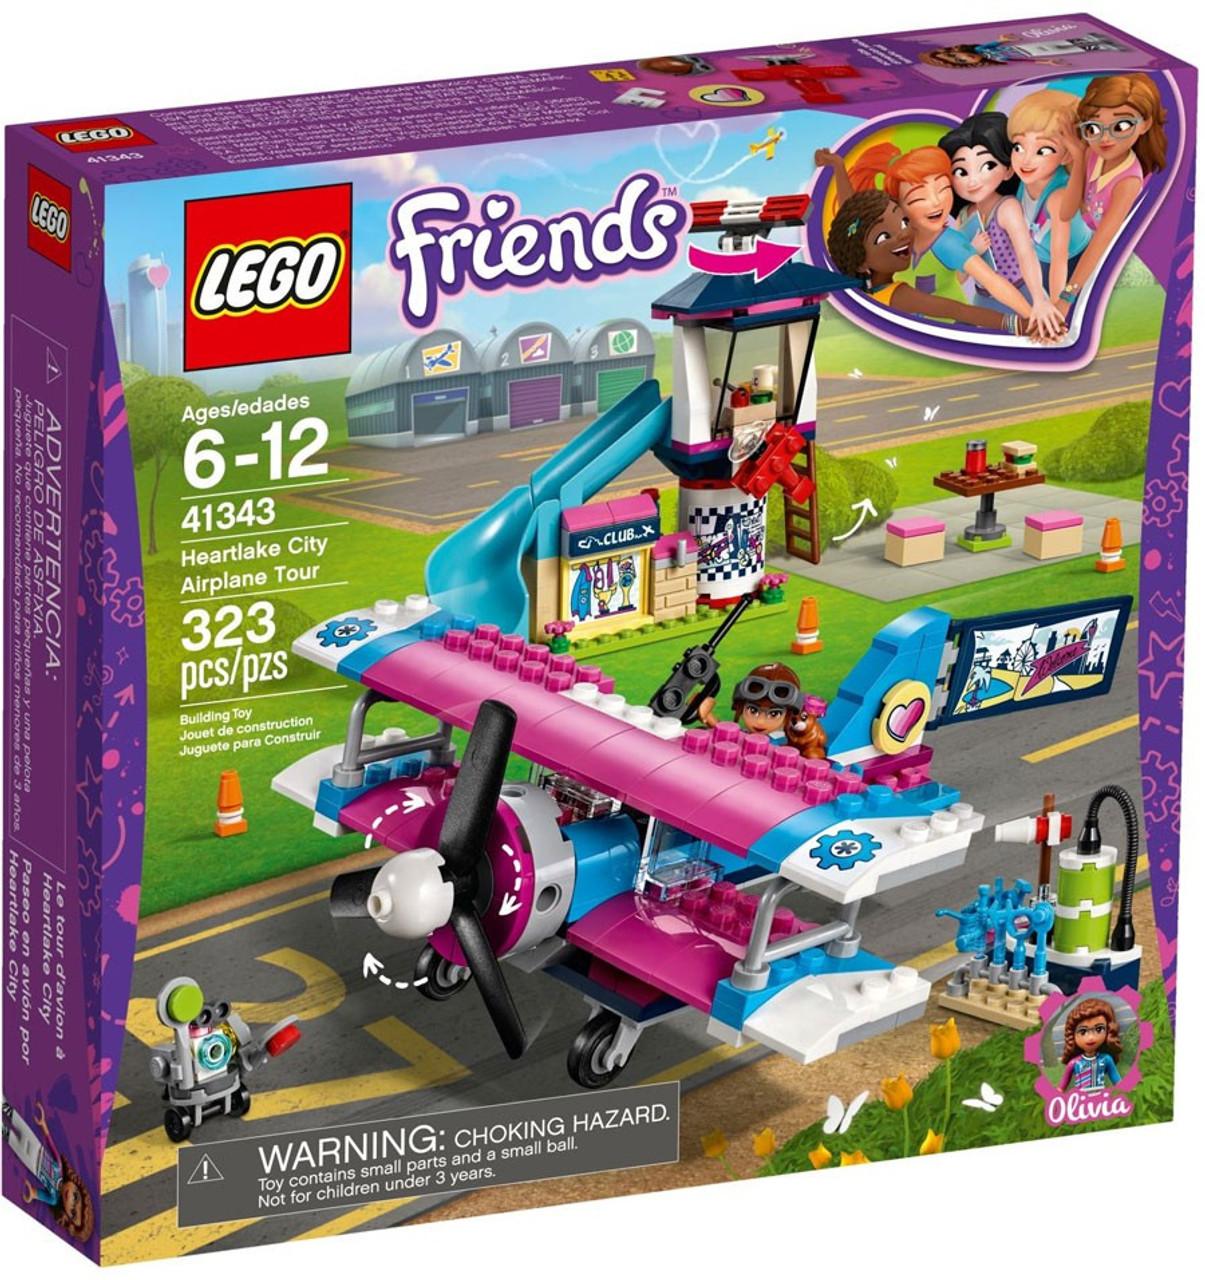 Folkekære LEGO Friends Heartlake City Airplane Tour Set 41343 - ToyWiz XW-65